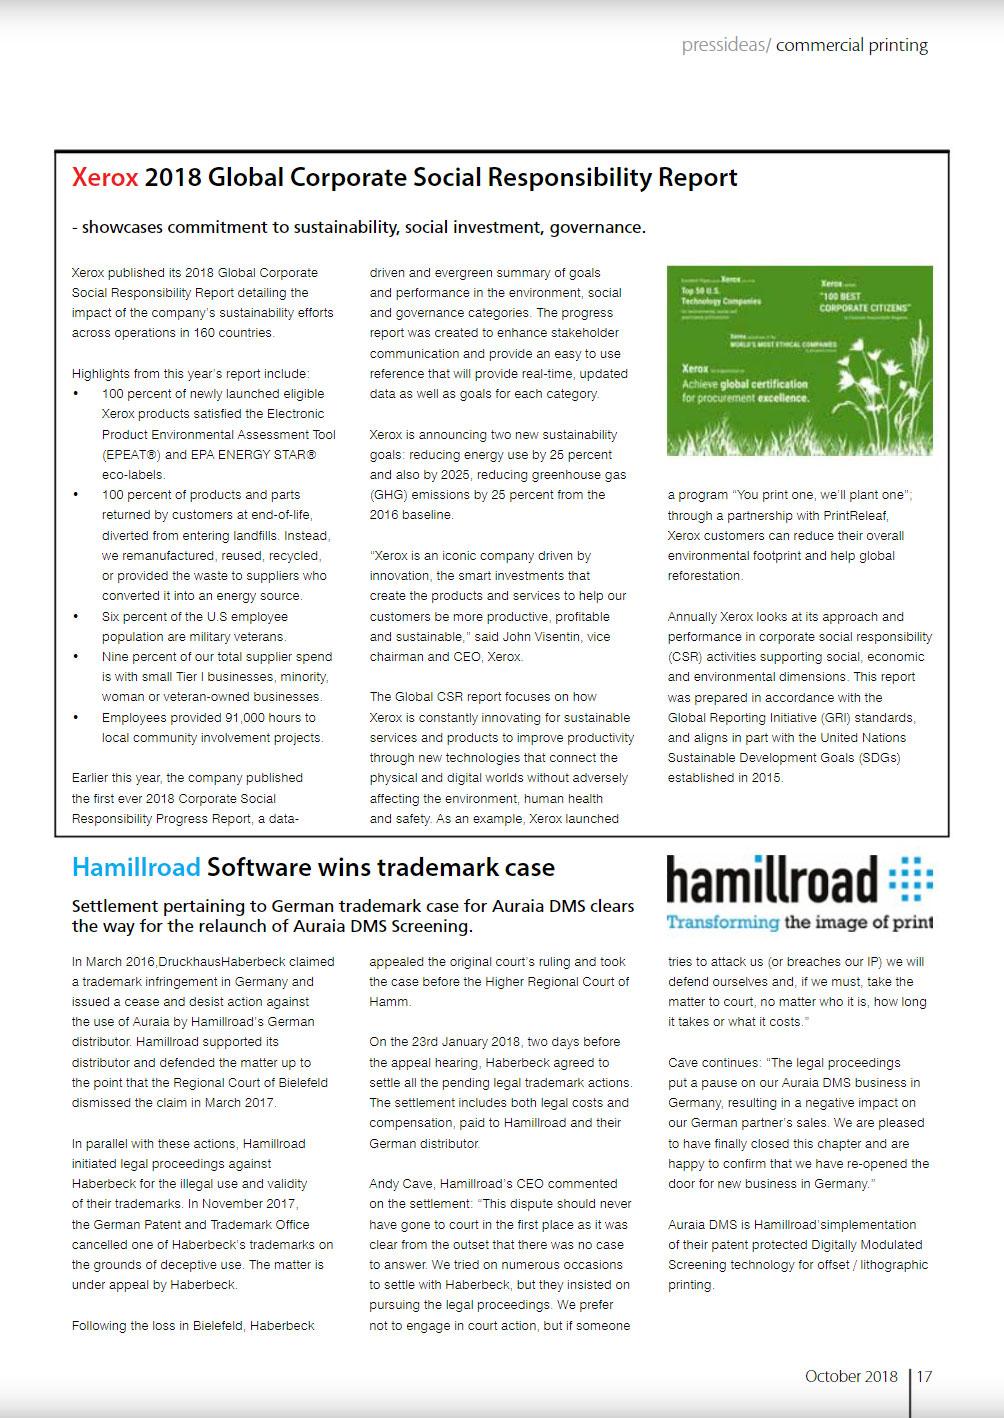 Hamillroad Software wins trademark case